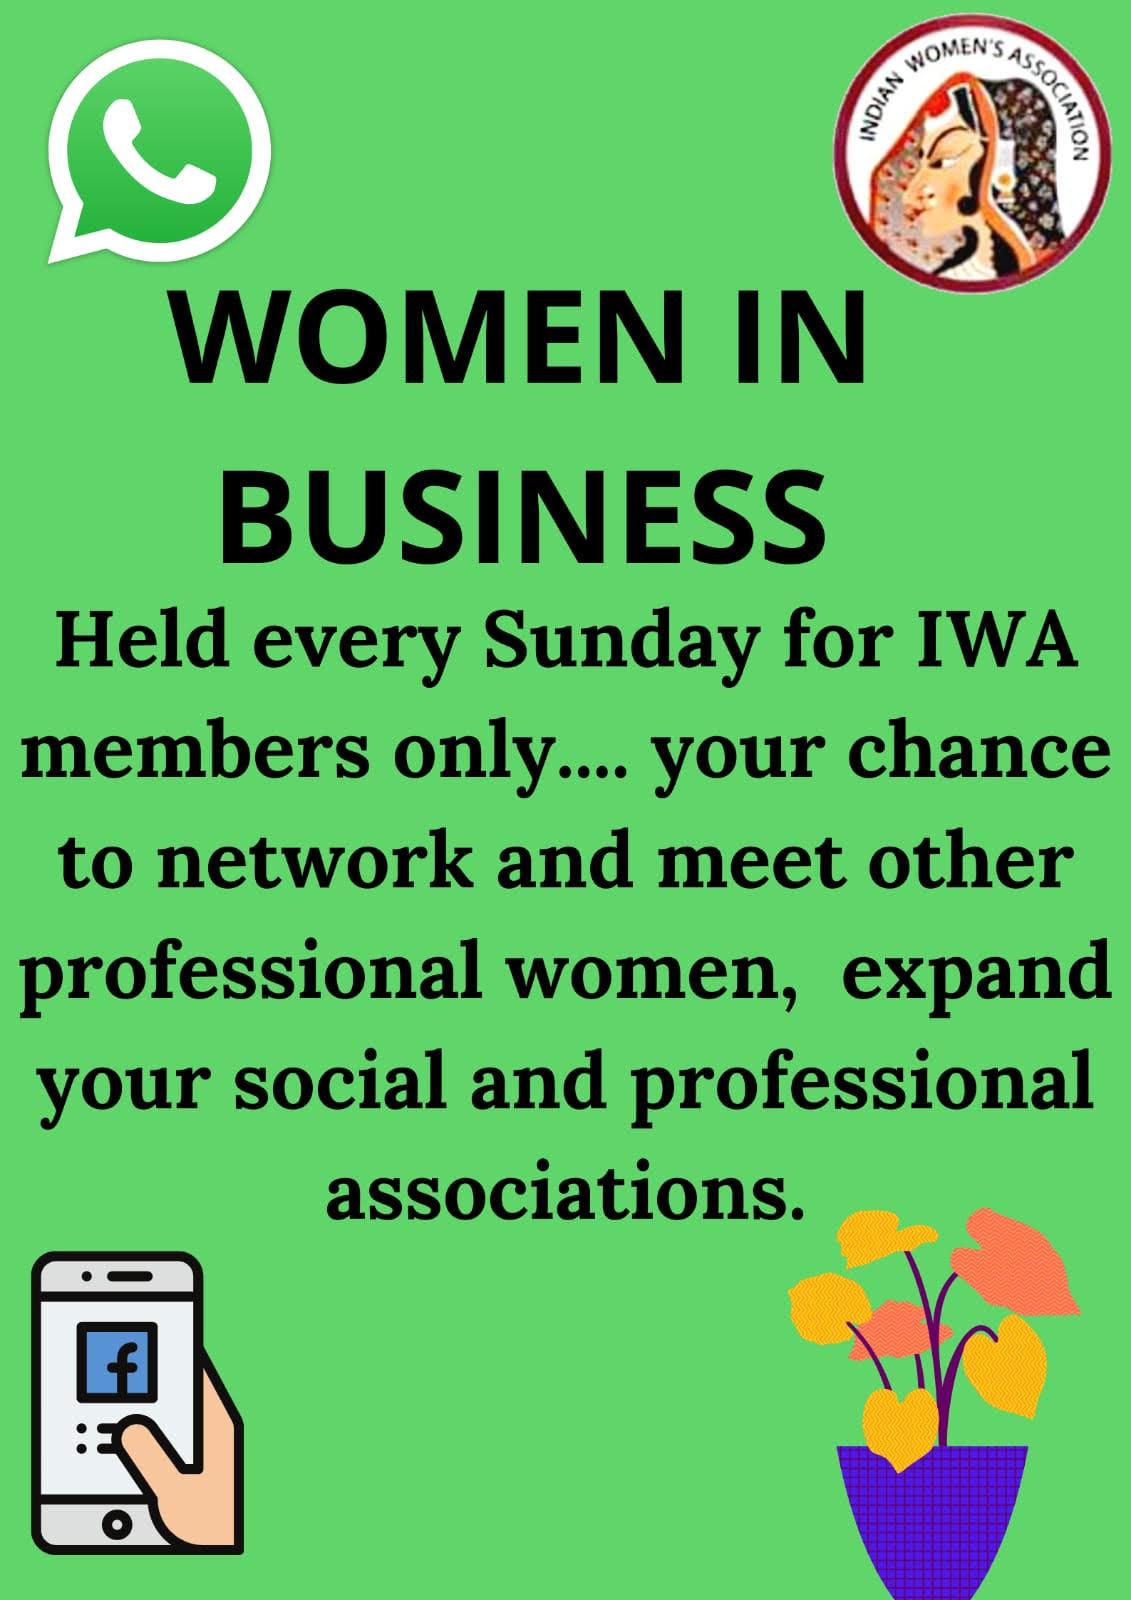 Women in Business by IWA Qatar